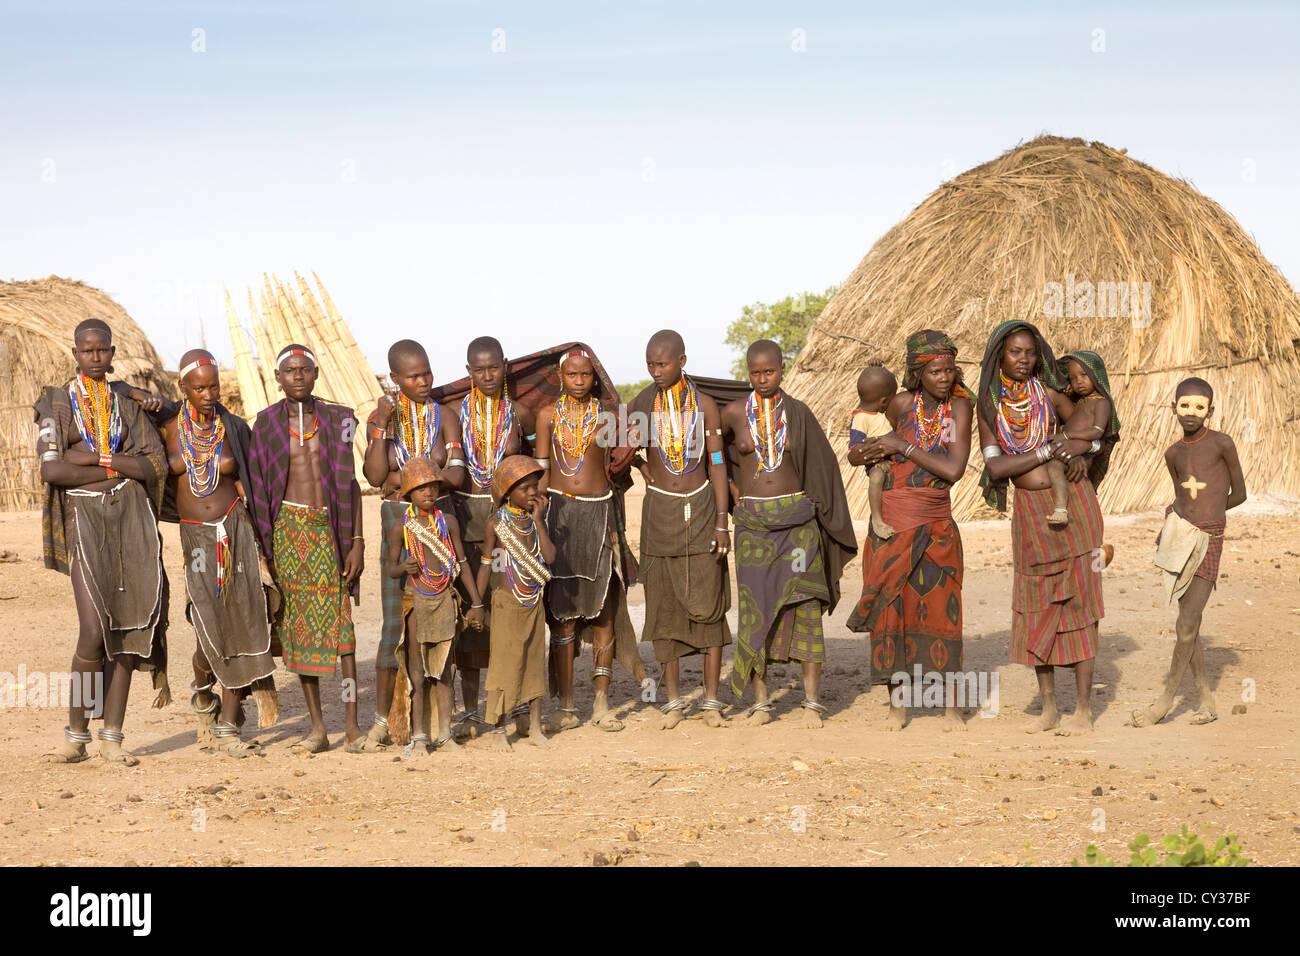 Erbore tribe, Omo River Valley, Ethiopia - Stock Image